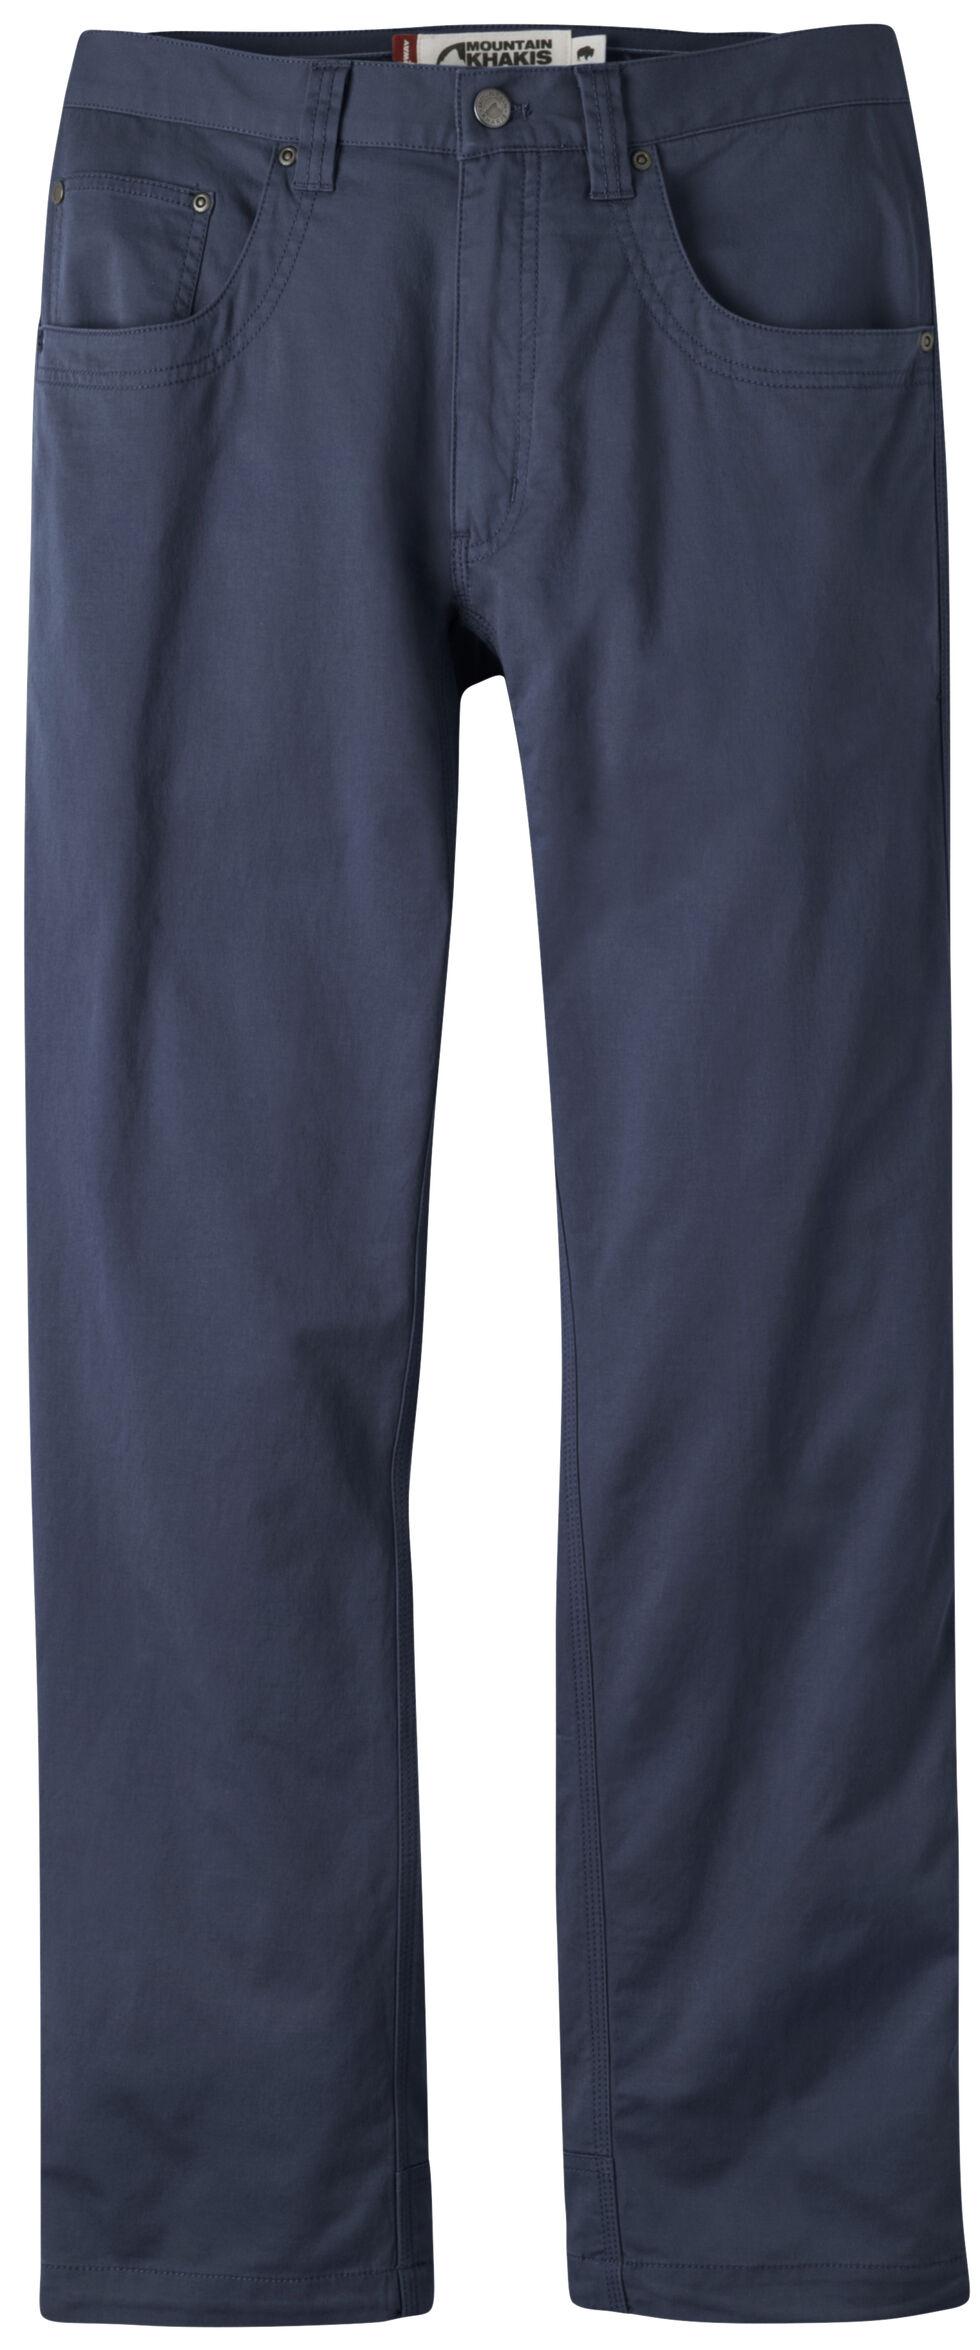 Mountain Khakis Men's Navy Camber Commuter Pants - Slim Fit , Navy, hi-res